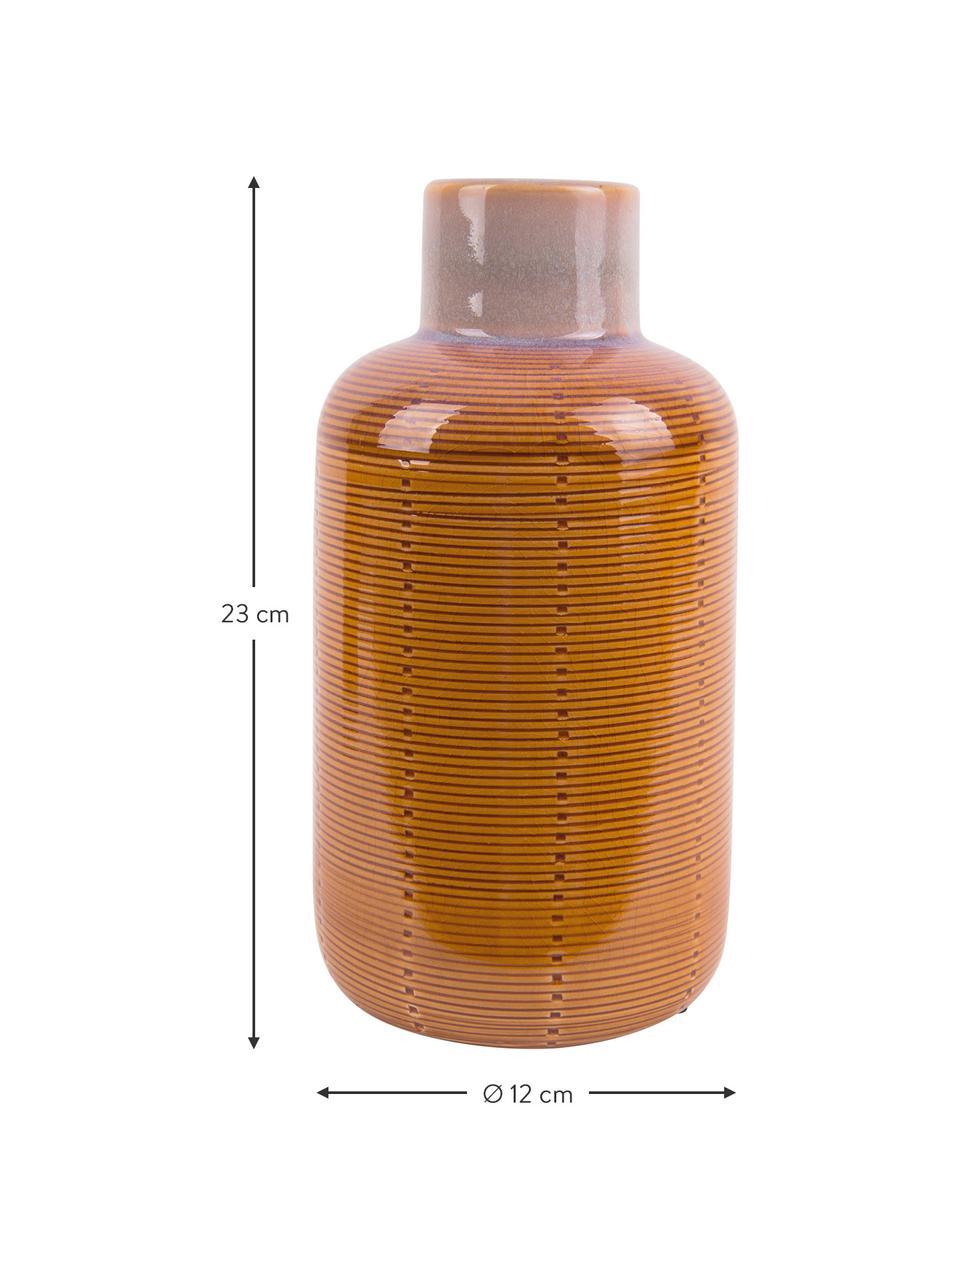 Vase Bottle aus Keramik, Keramik, Orange, Ø 12 x H 23 cm